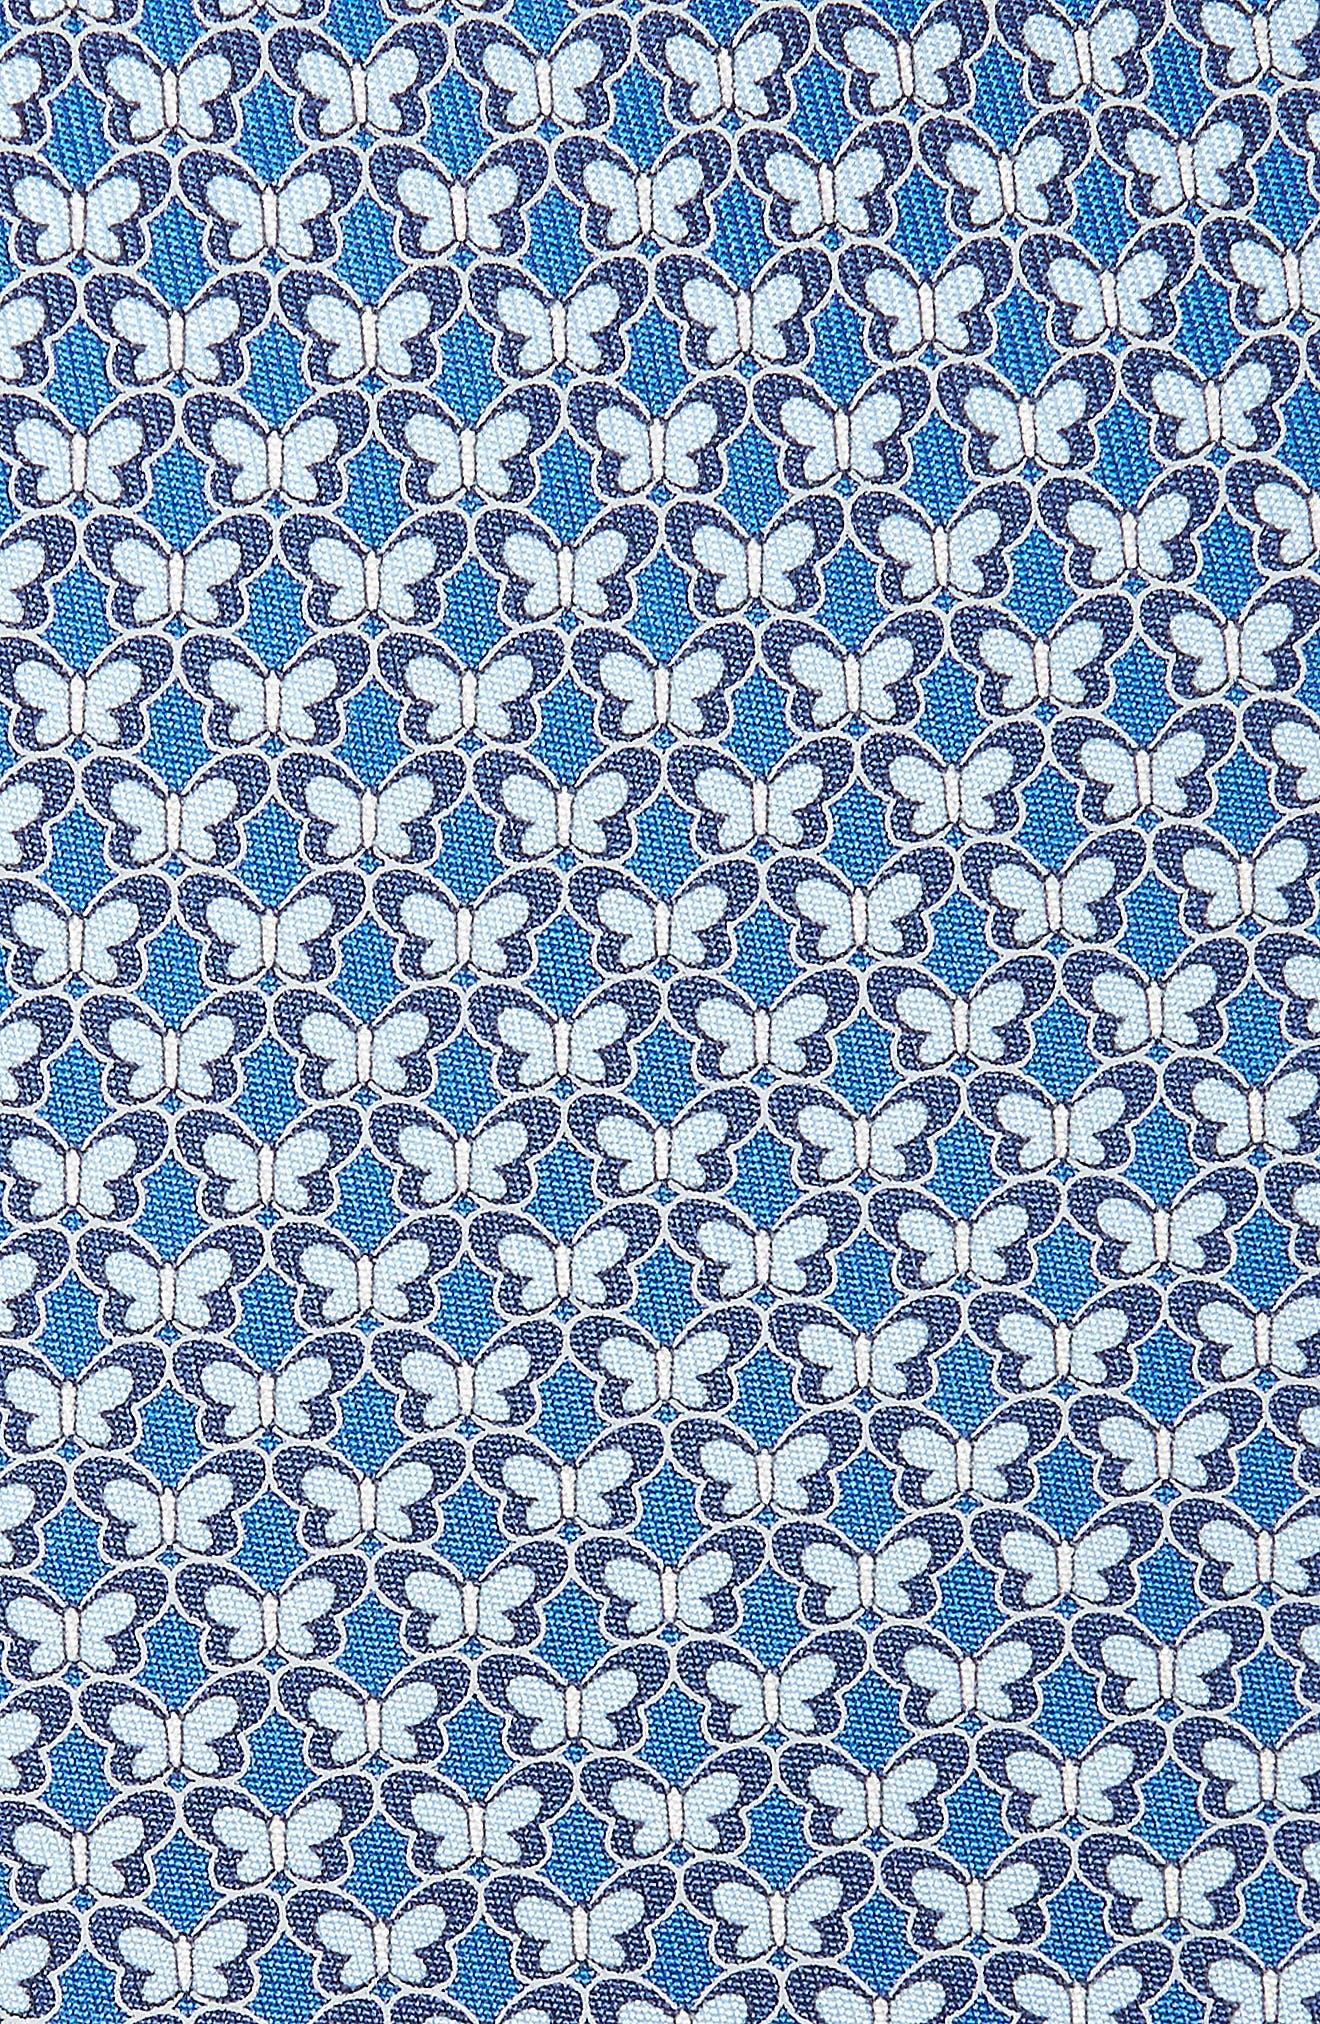 Butterfly Print Silk Tie,                             Alternate thumbnail 2, color,                             Marine Blue